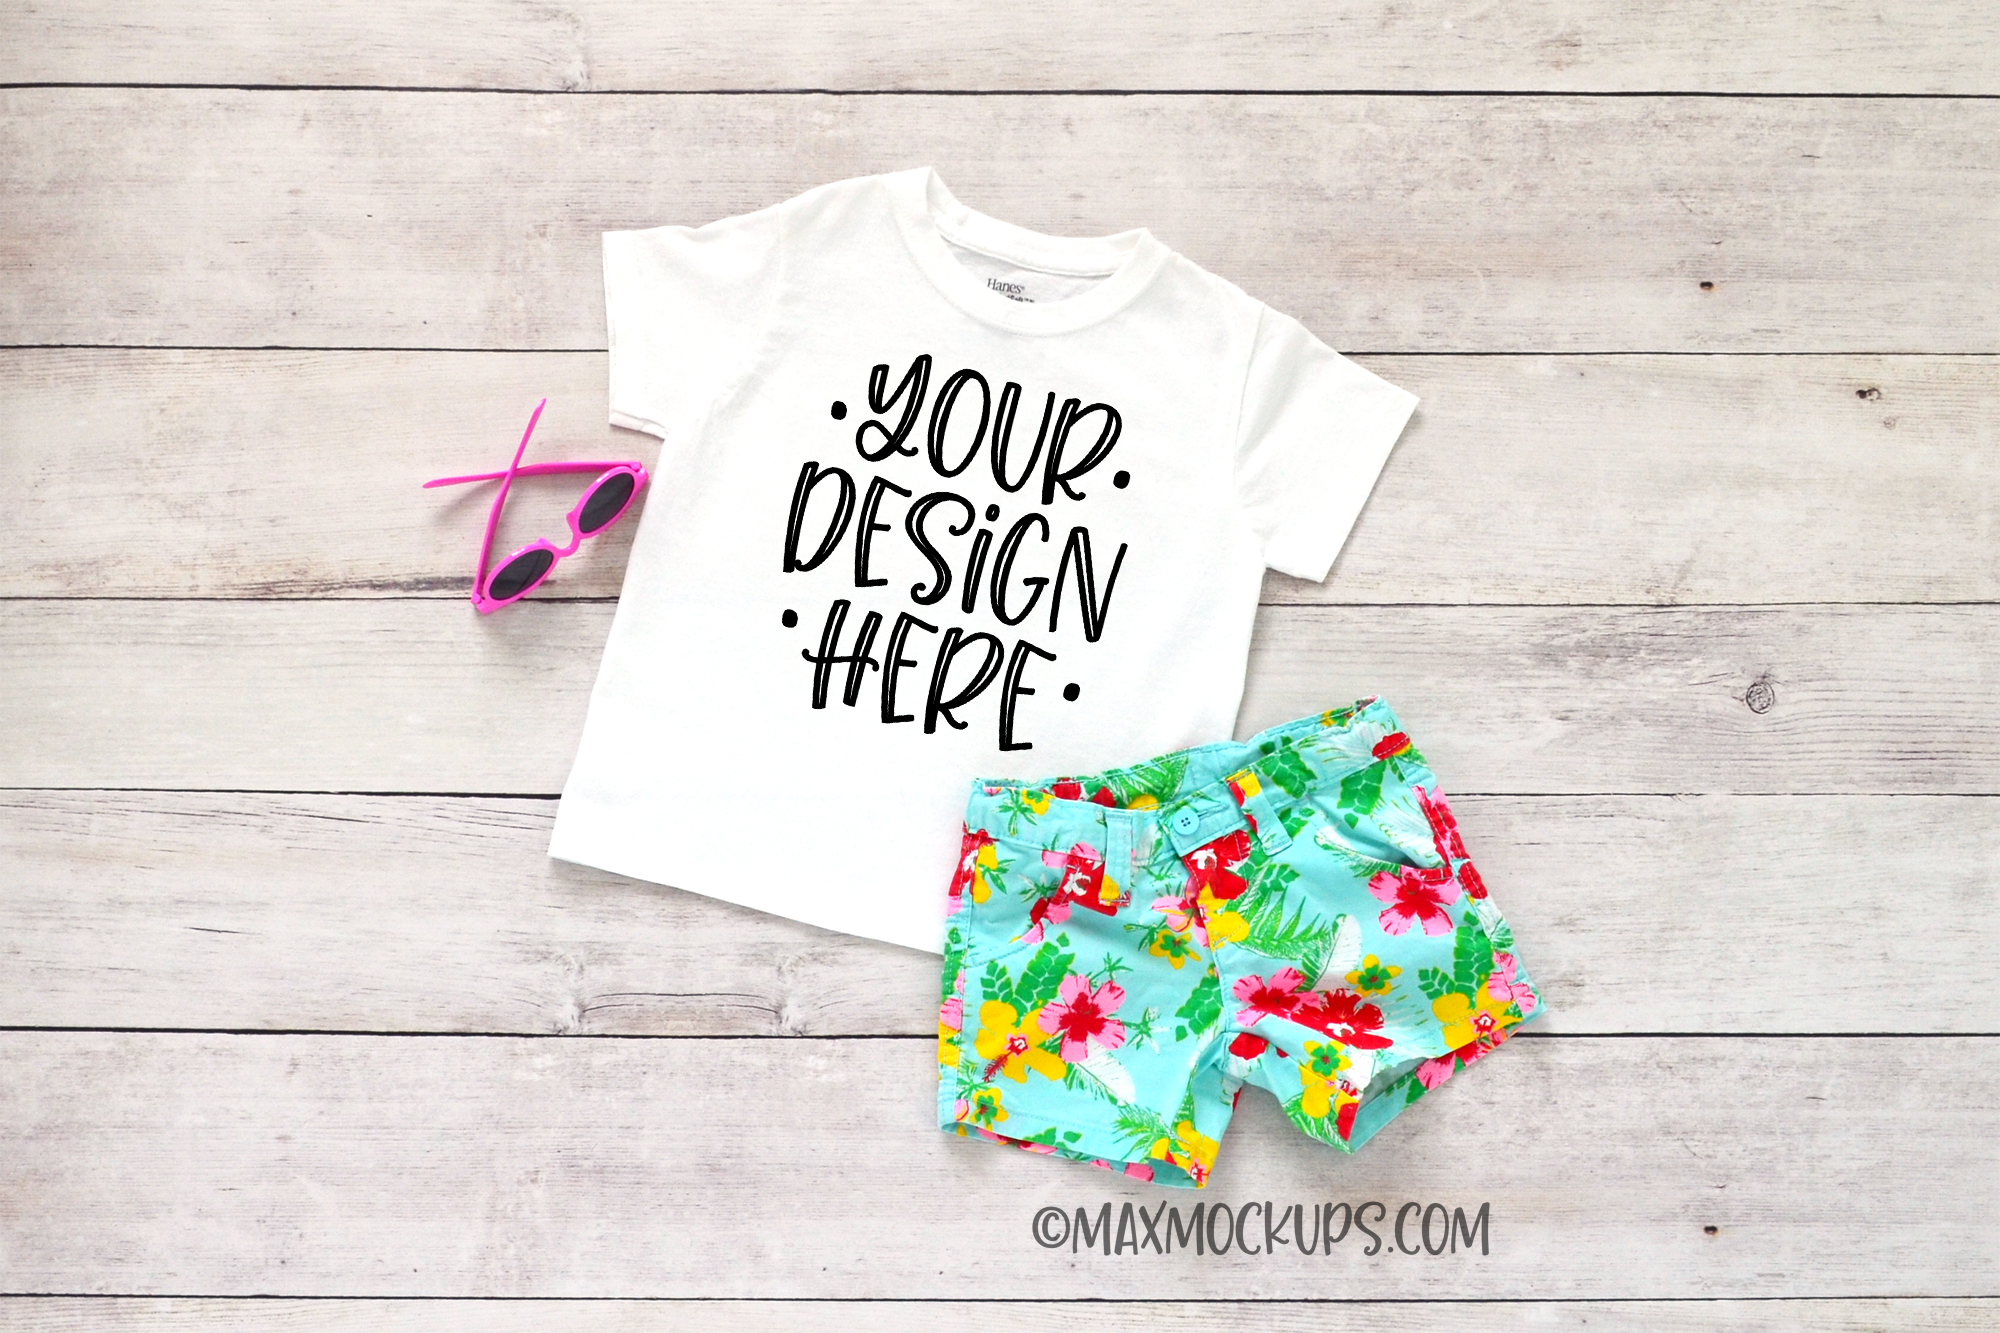 White Kids Shirt Mockup Shorts And Sunglasses